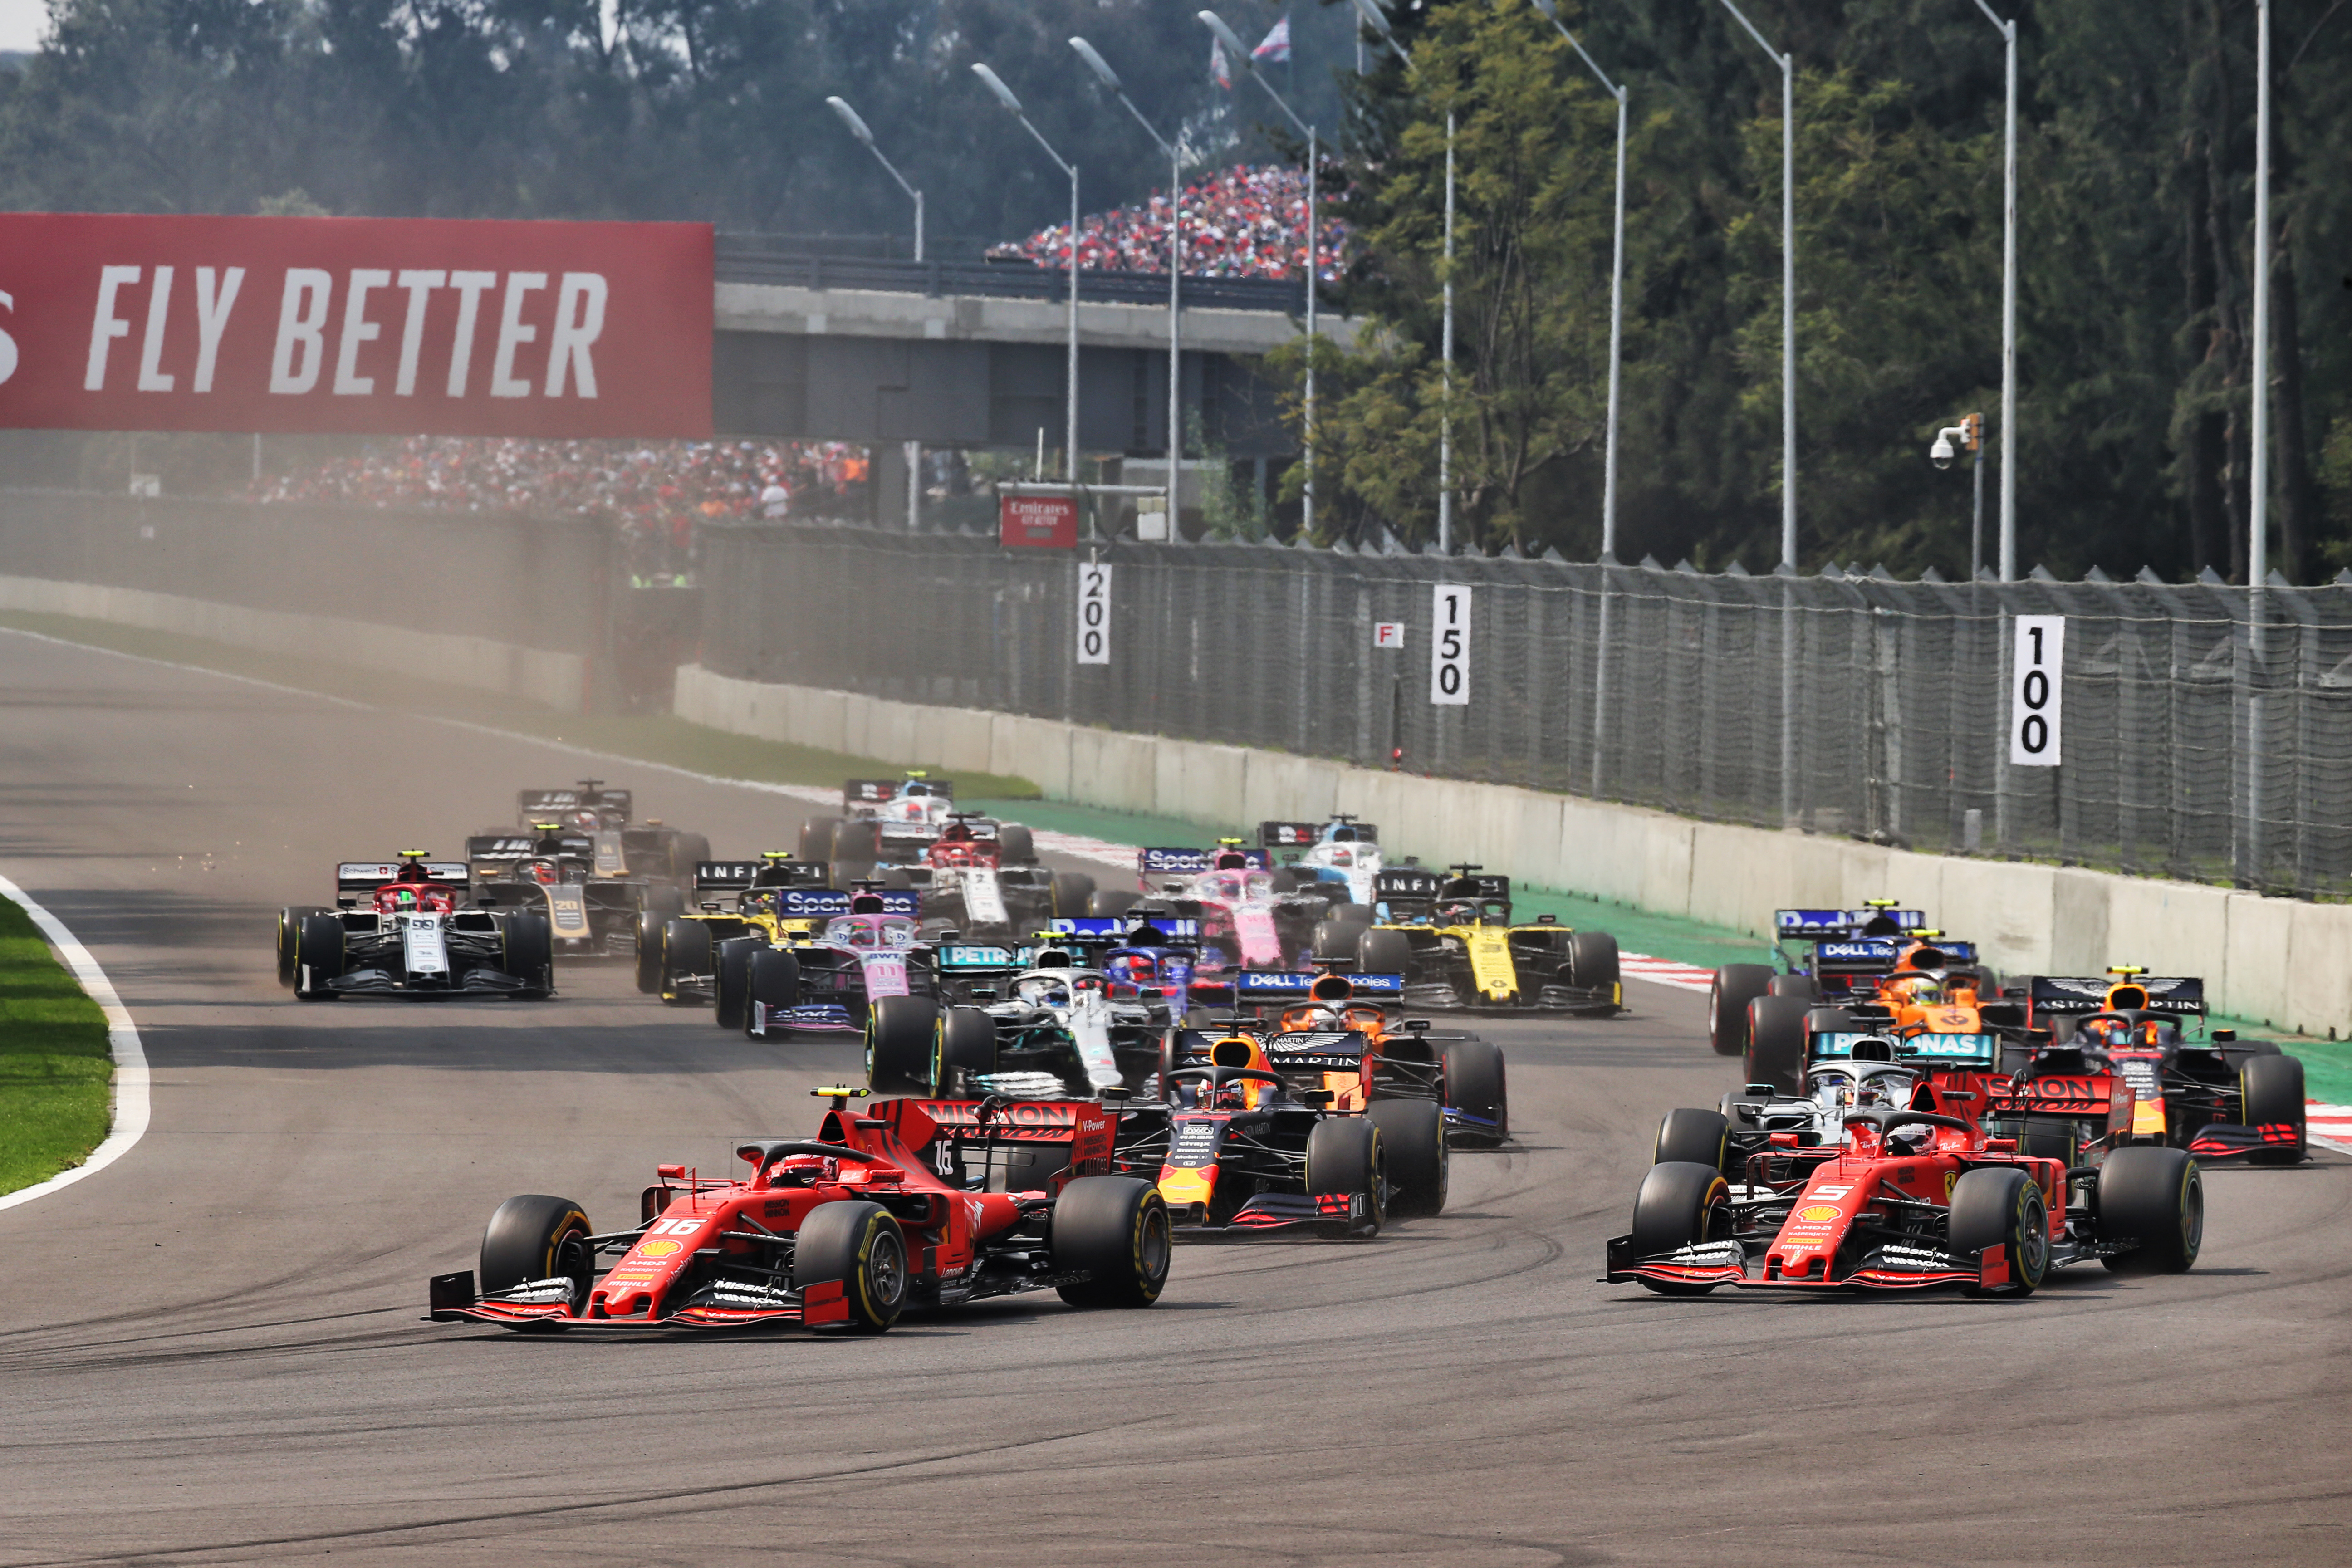 Sebastian Vettel Charles Leclerc F1 Ferrari 2019